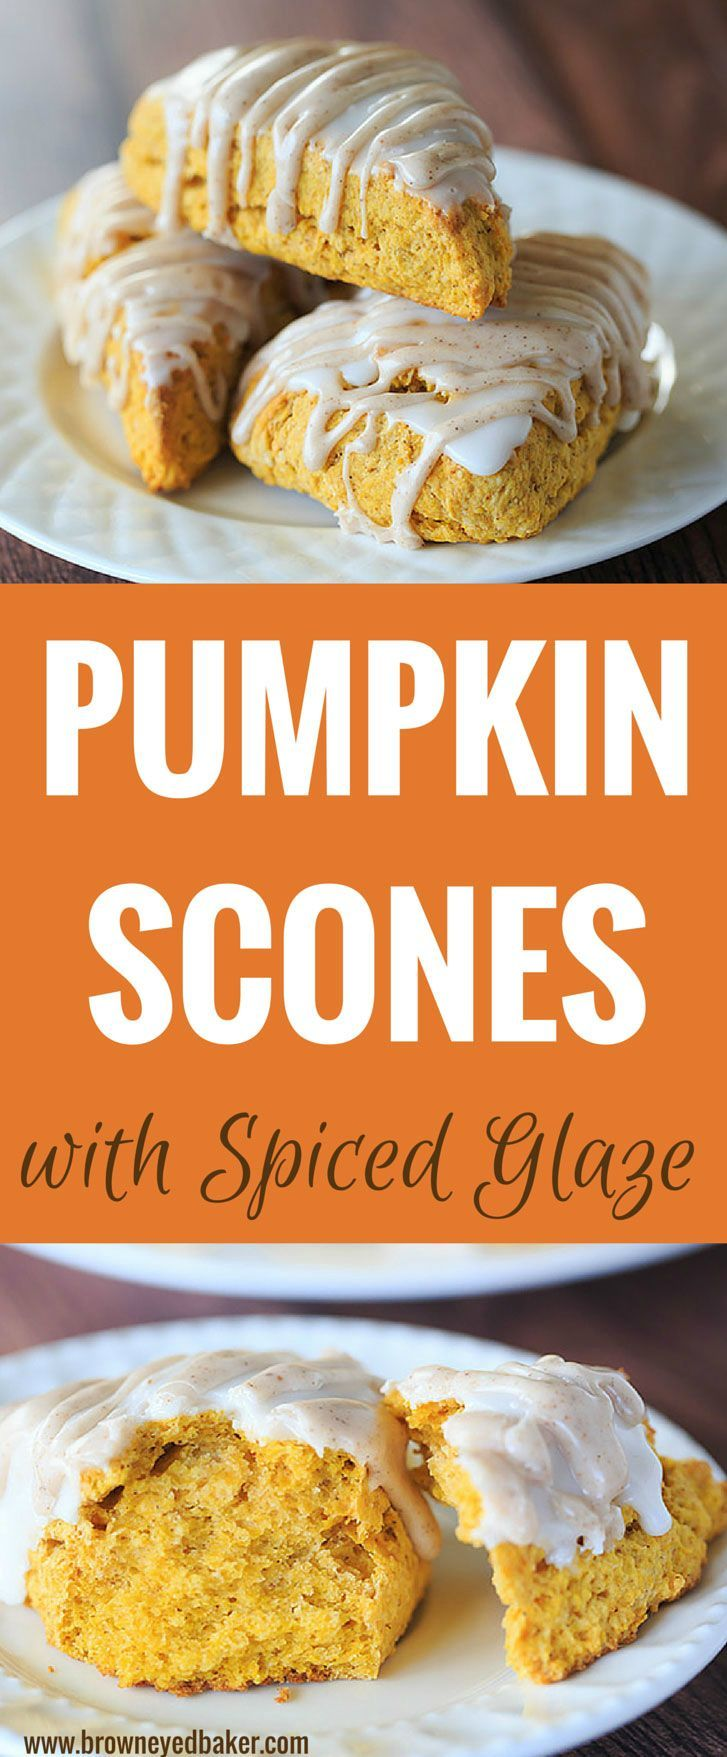 Pumpkin Scones with Spiced Glaze - A Starbucks copycat! | http://www ...